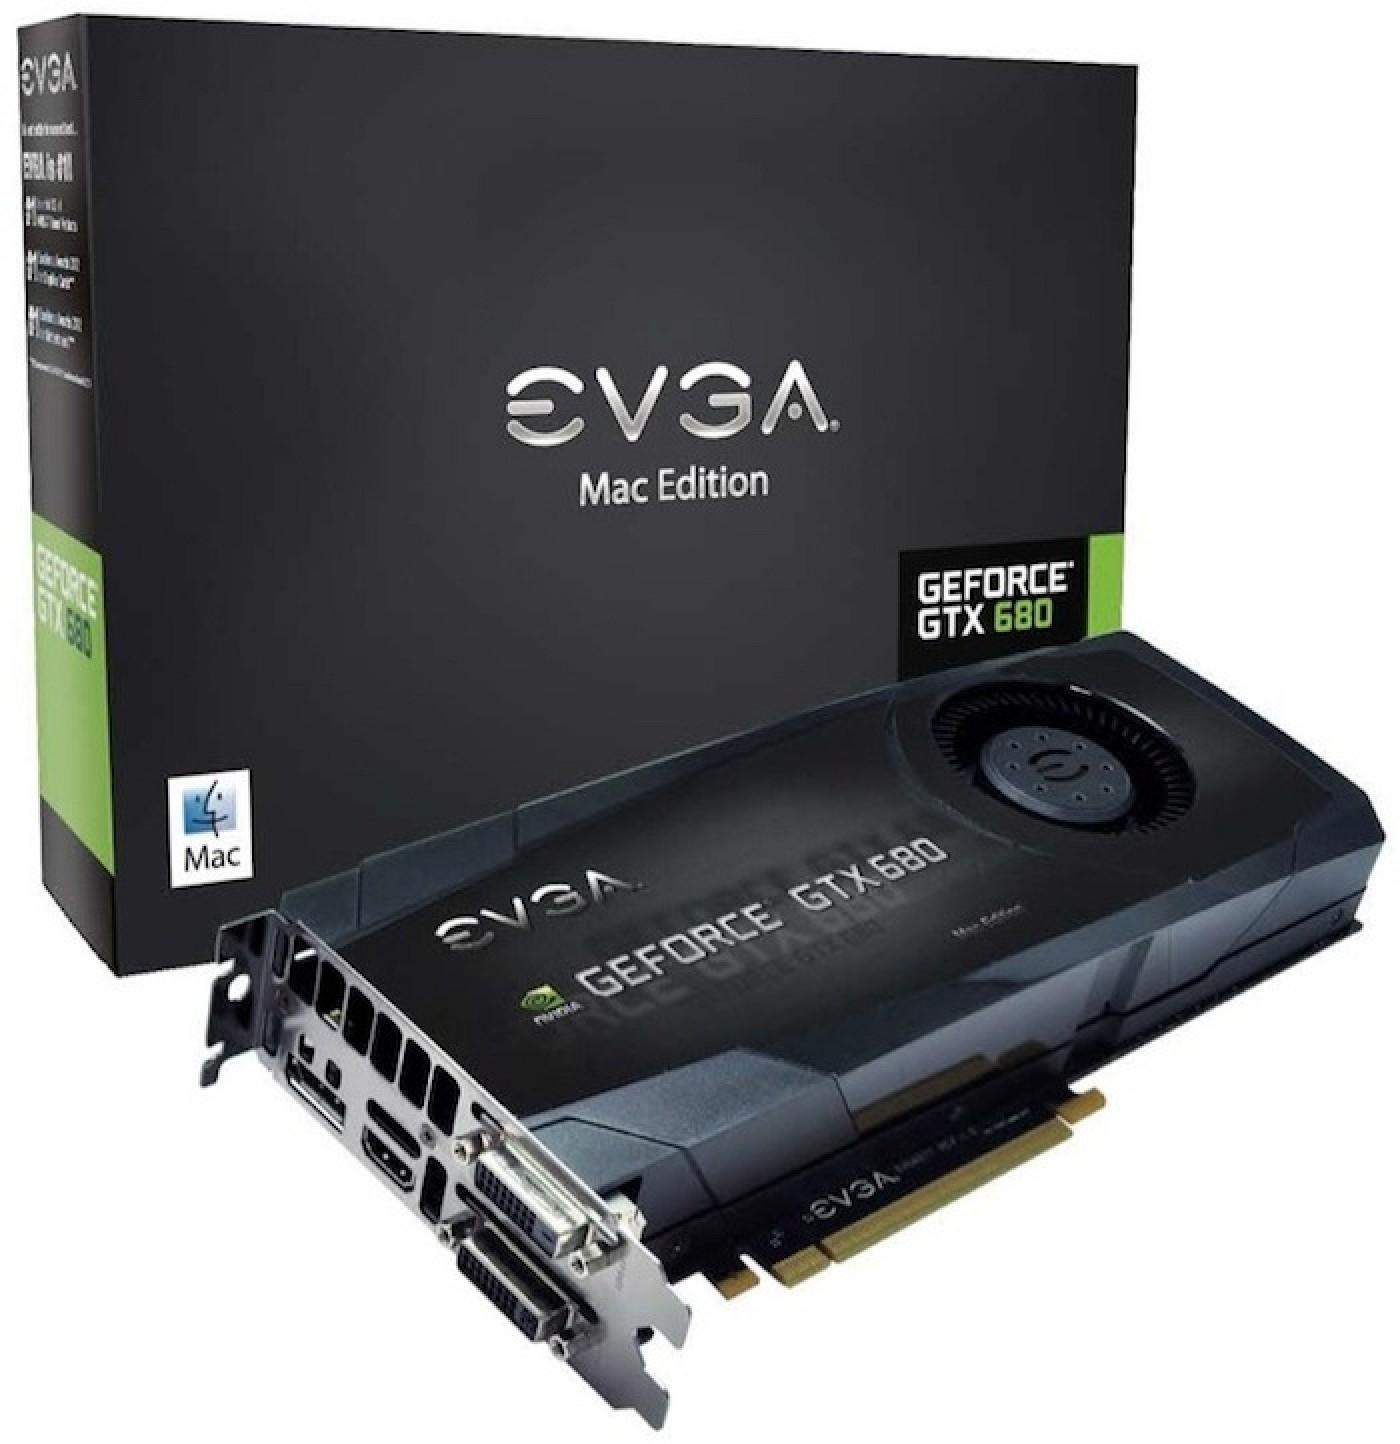 evga announces geforce gtx 680 mac edition graphics card